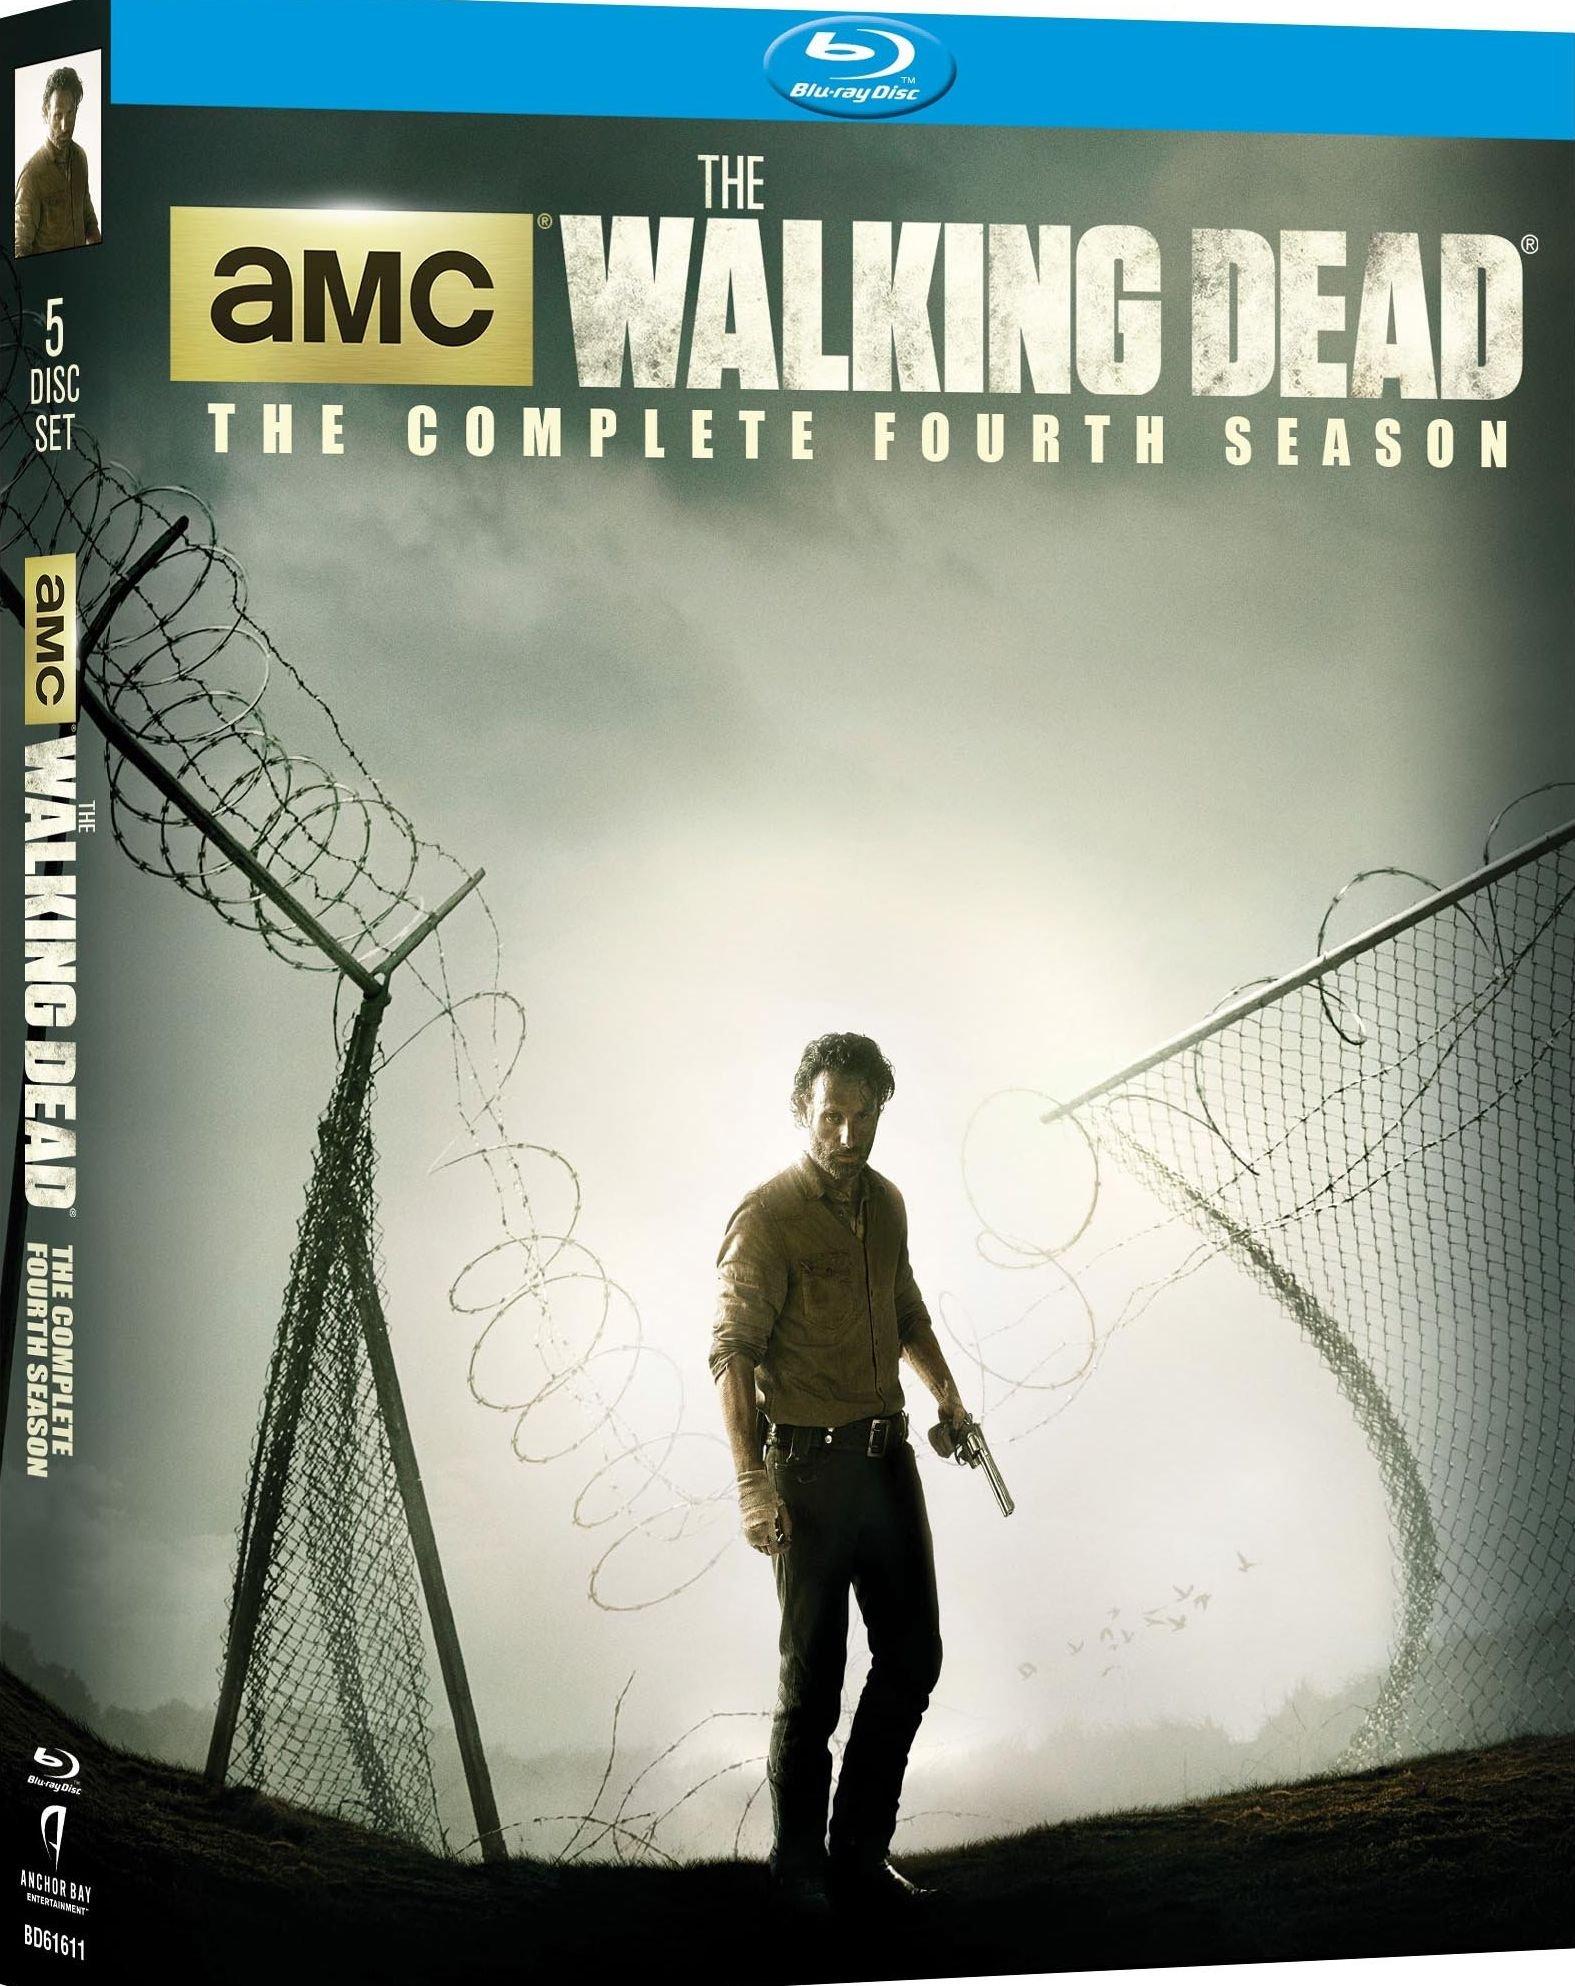 The Walking Dead: Season 4 [Blu-ray] by Starz / Anchor Bay